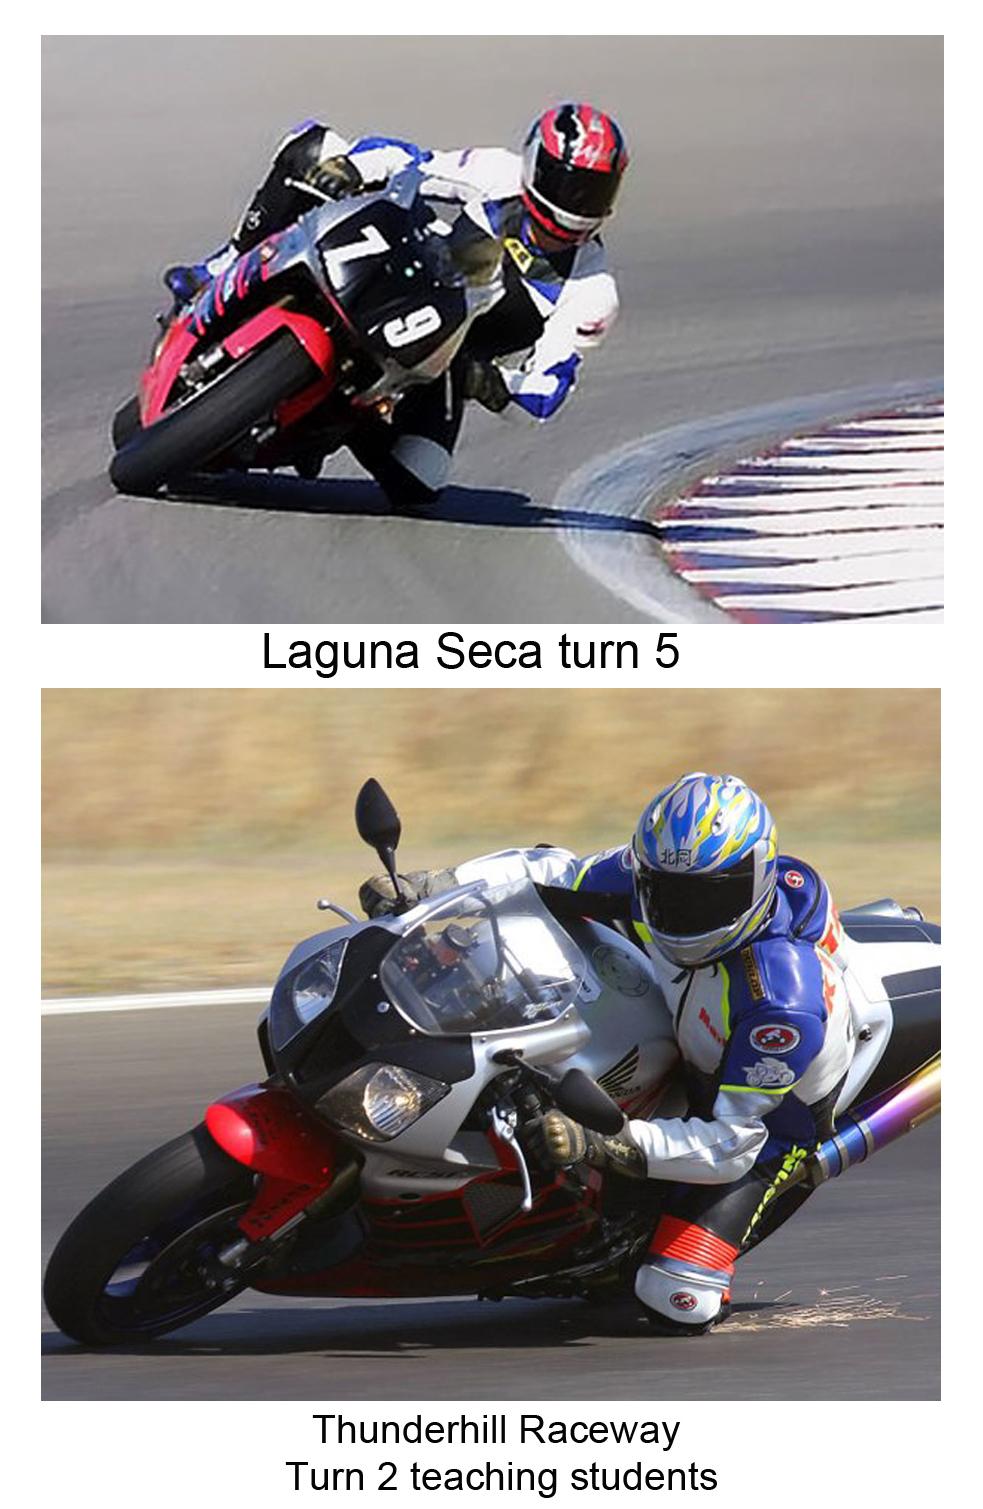 Mark Kitaoka riding on motorcycle